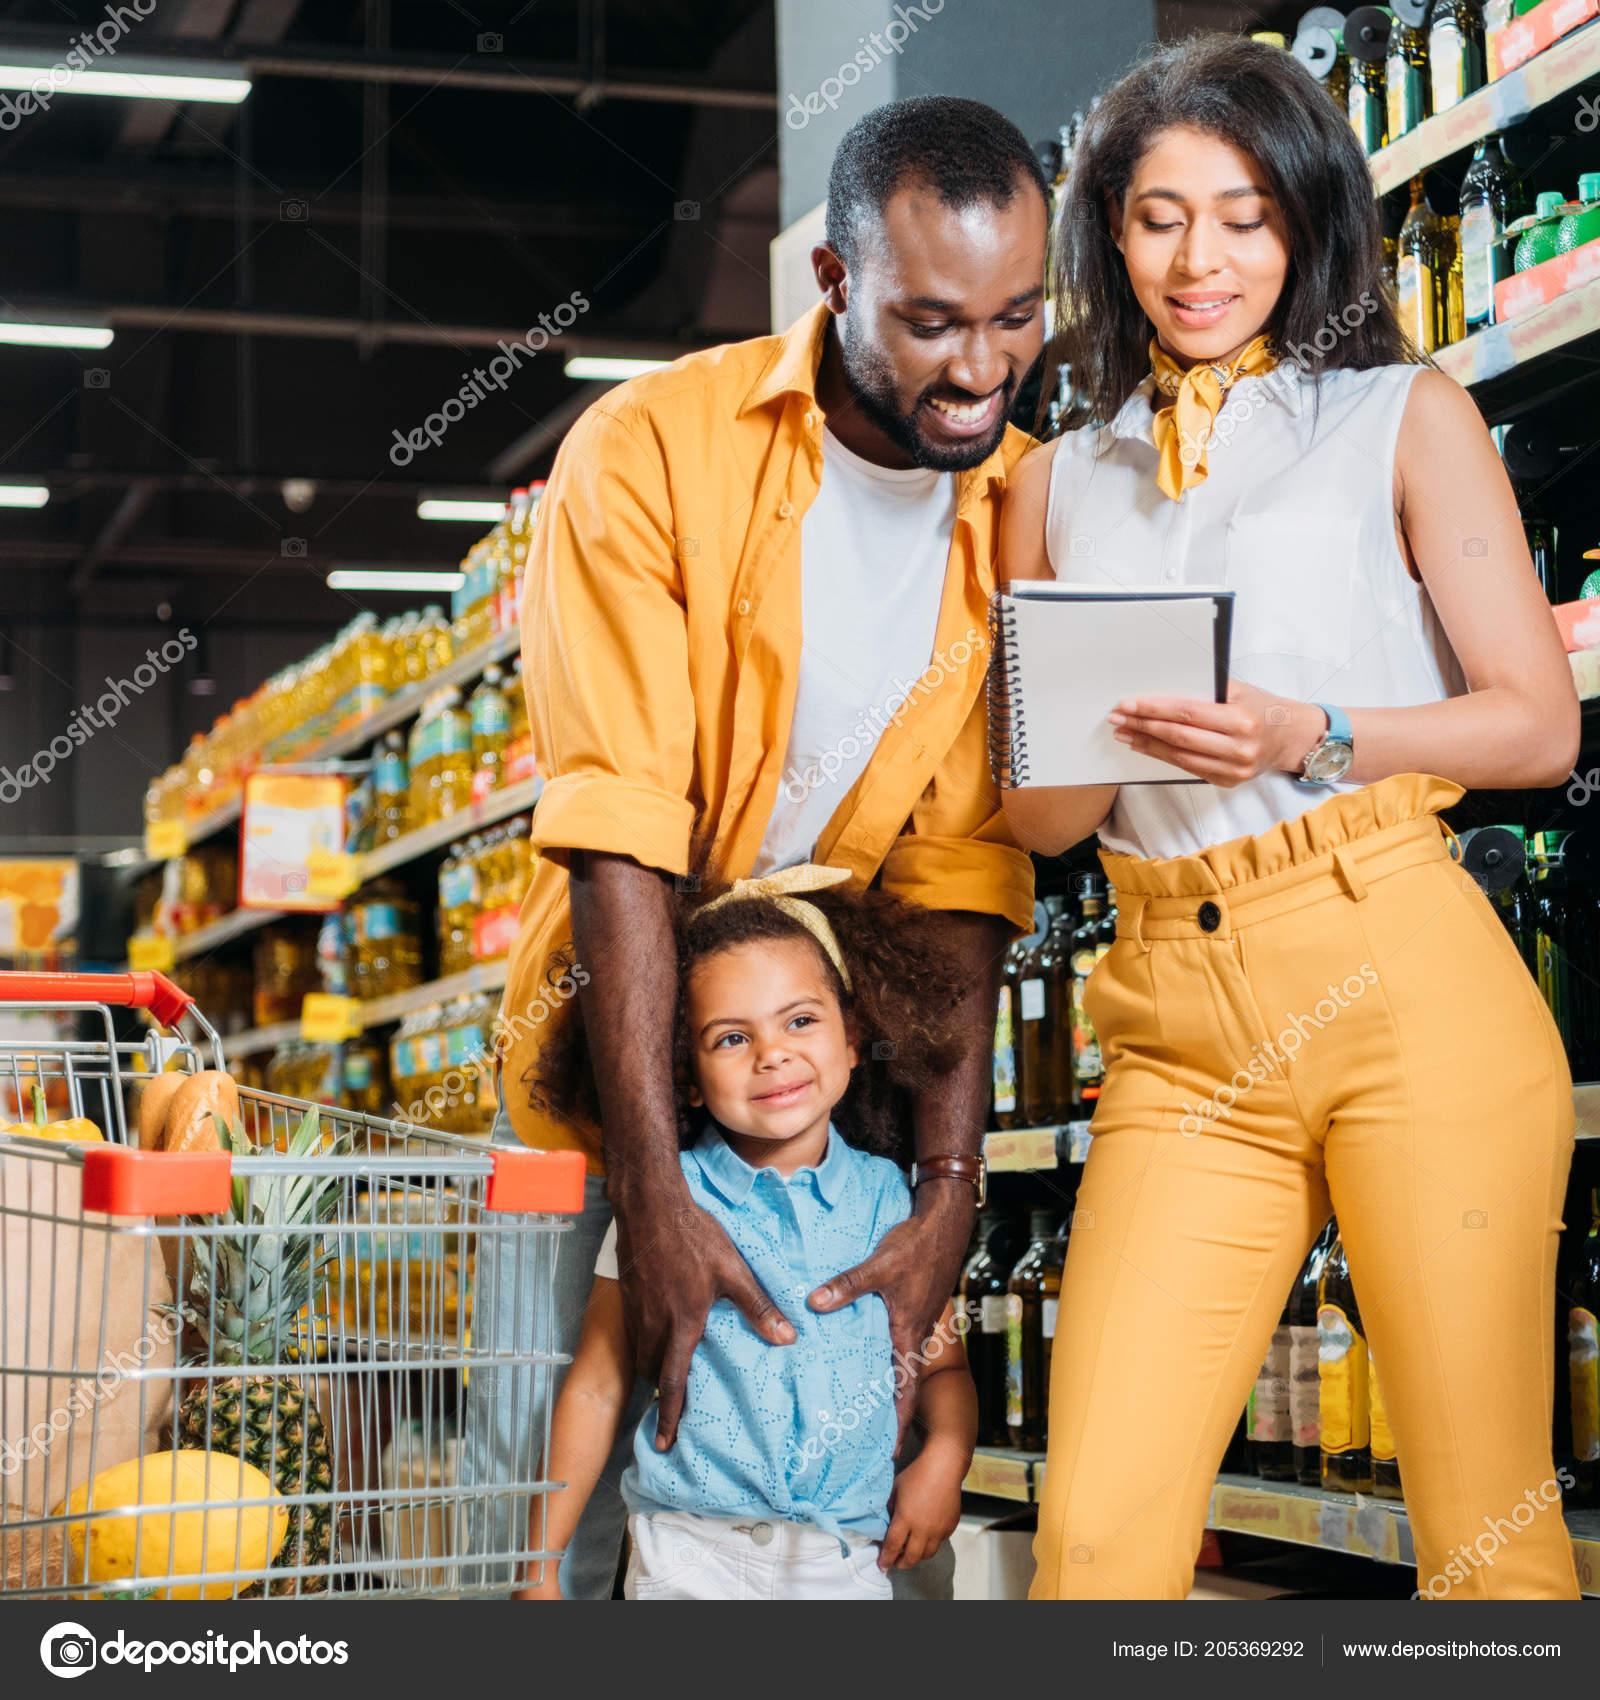 feliz familia afroamericana con hija mirando lista supermercado